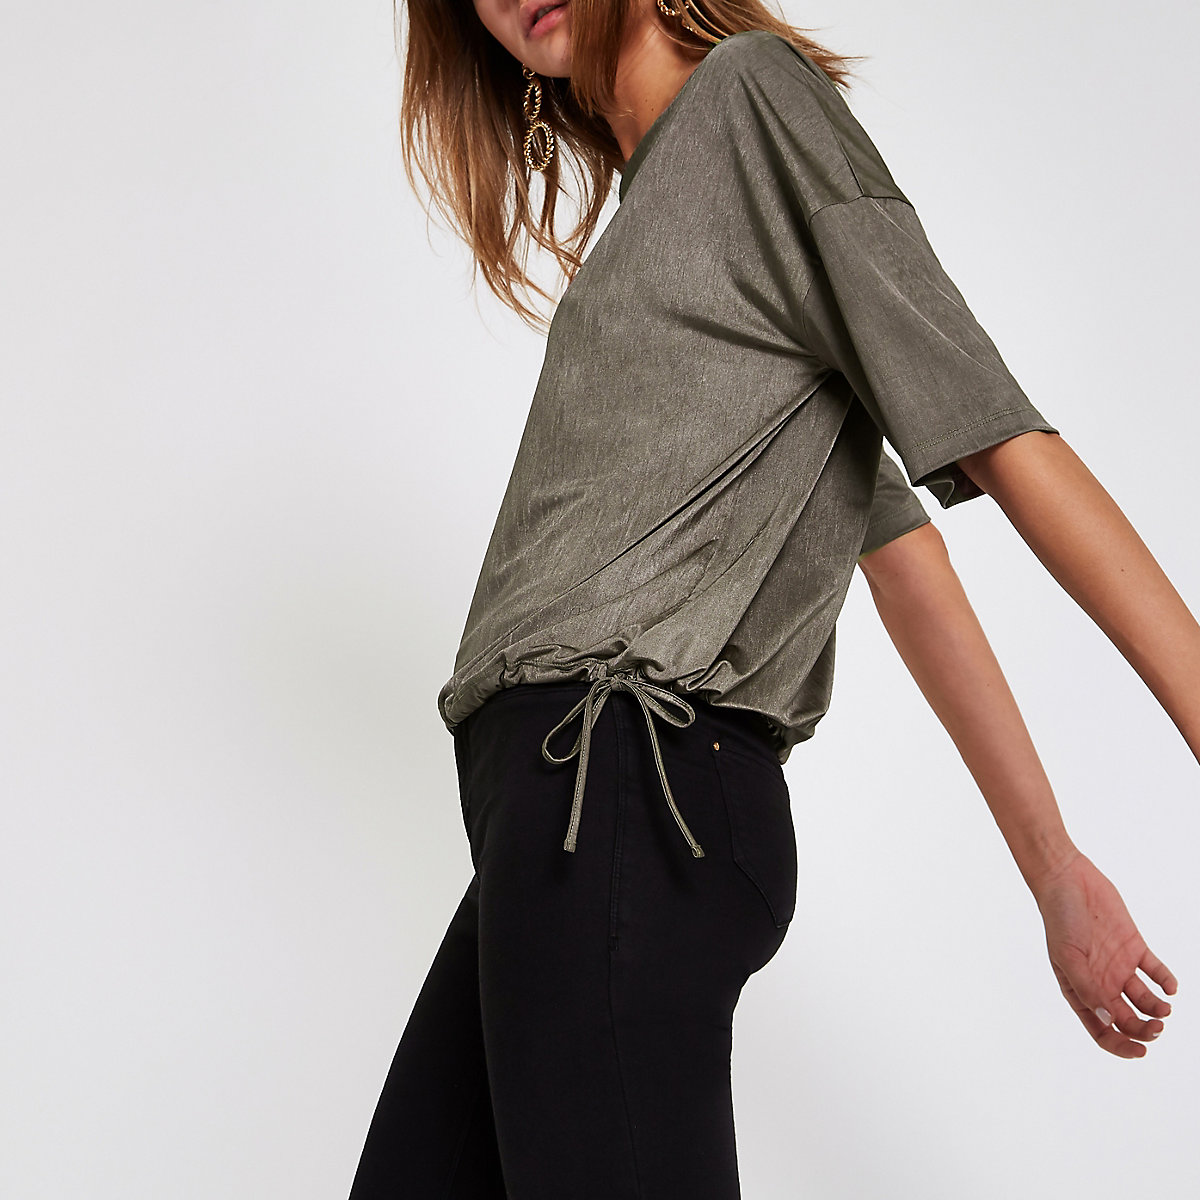 Khaki short sleeve elastic top